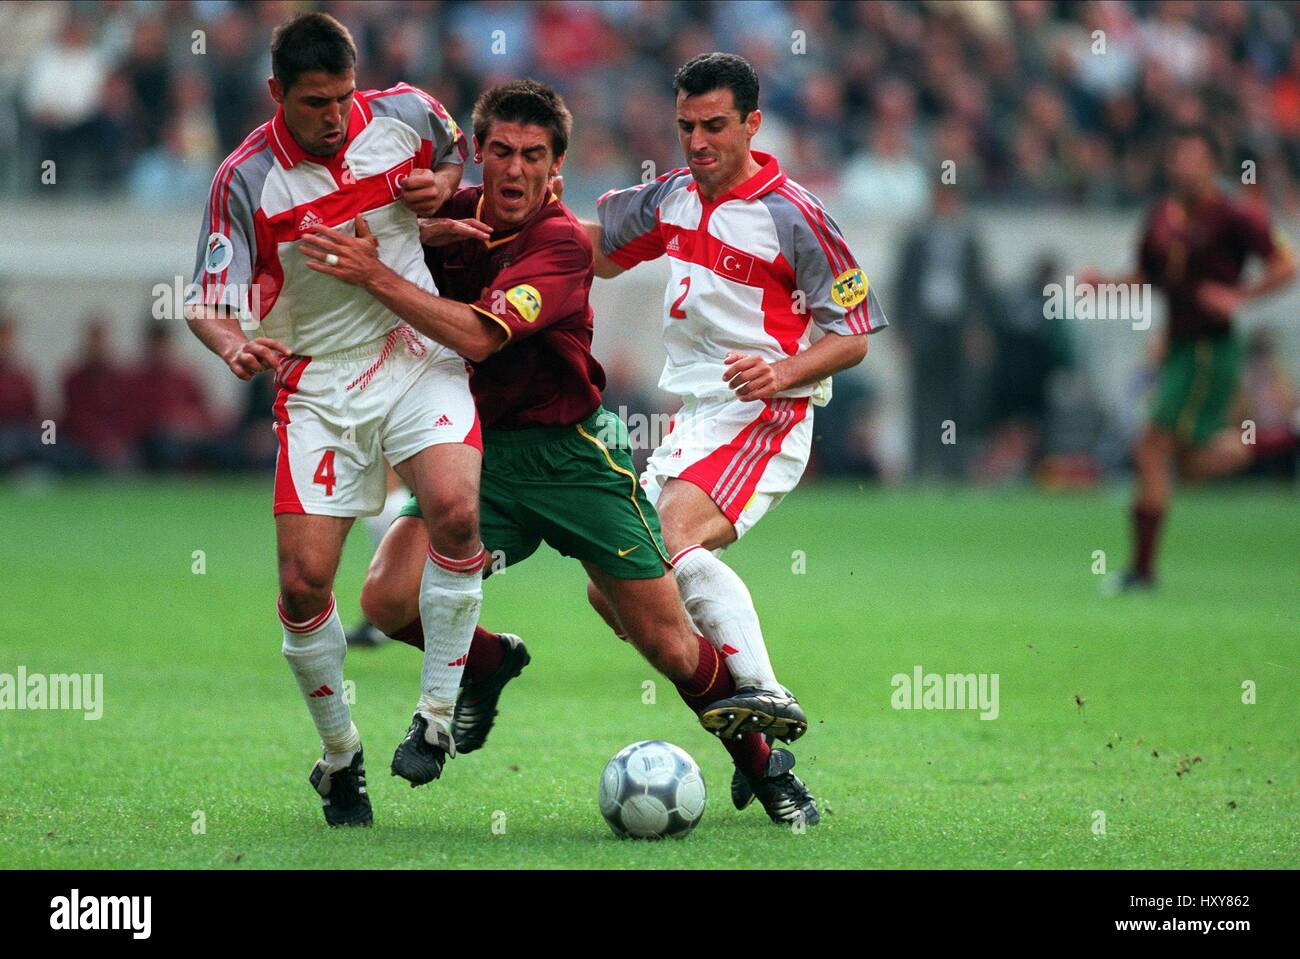 FAITH & SA PINTO & TAYFUR TURKEY V PORTUGAL 24 June 2000 - Stock Image